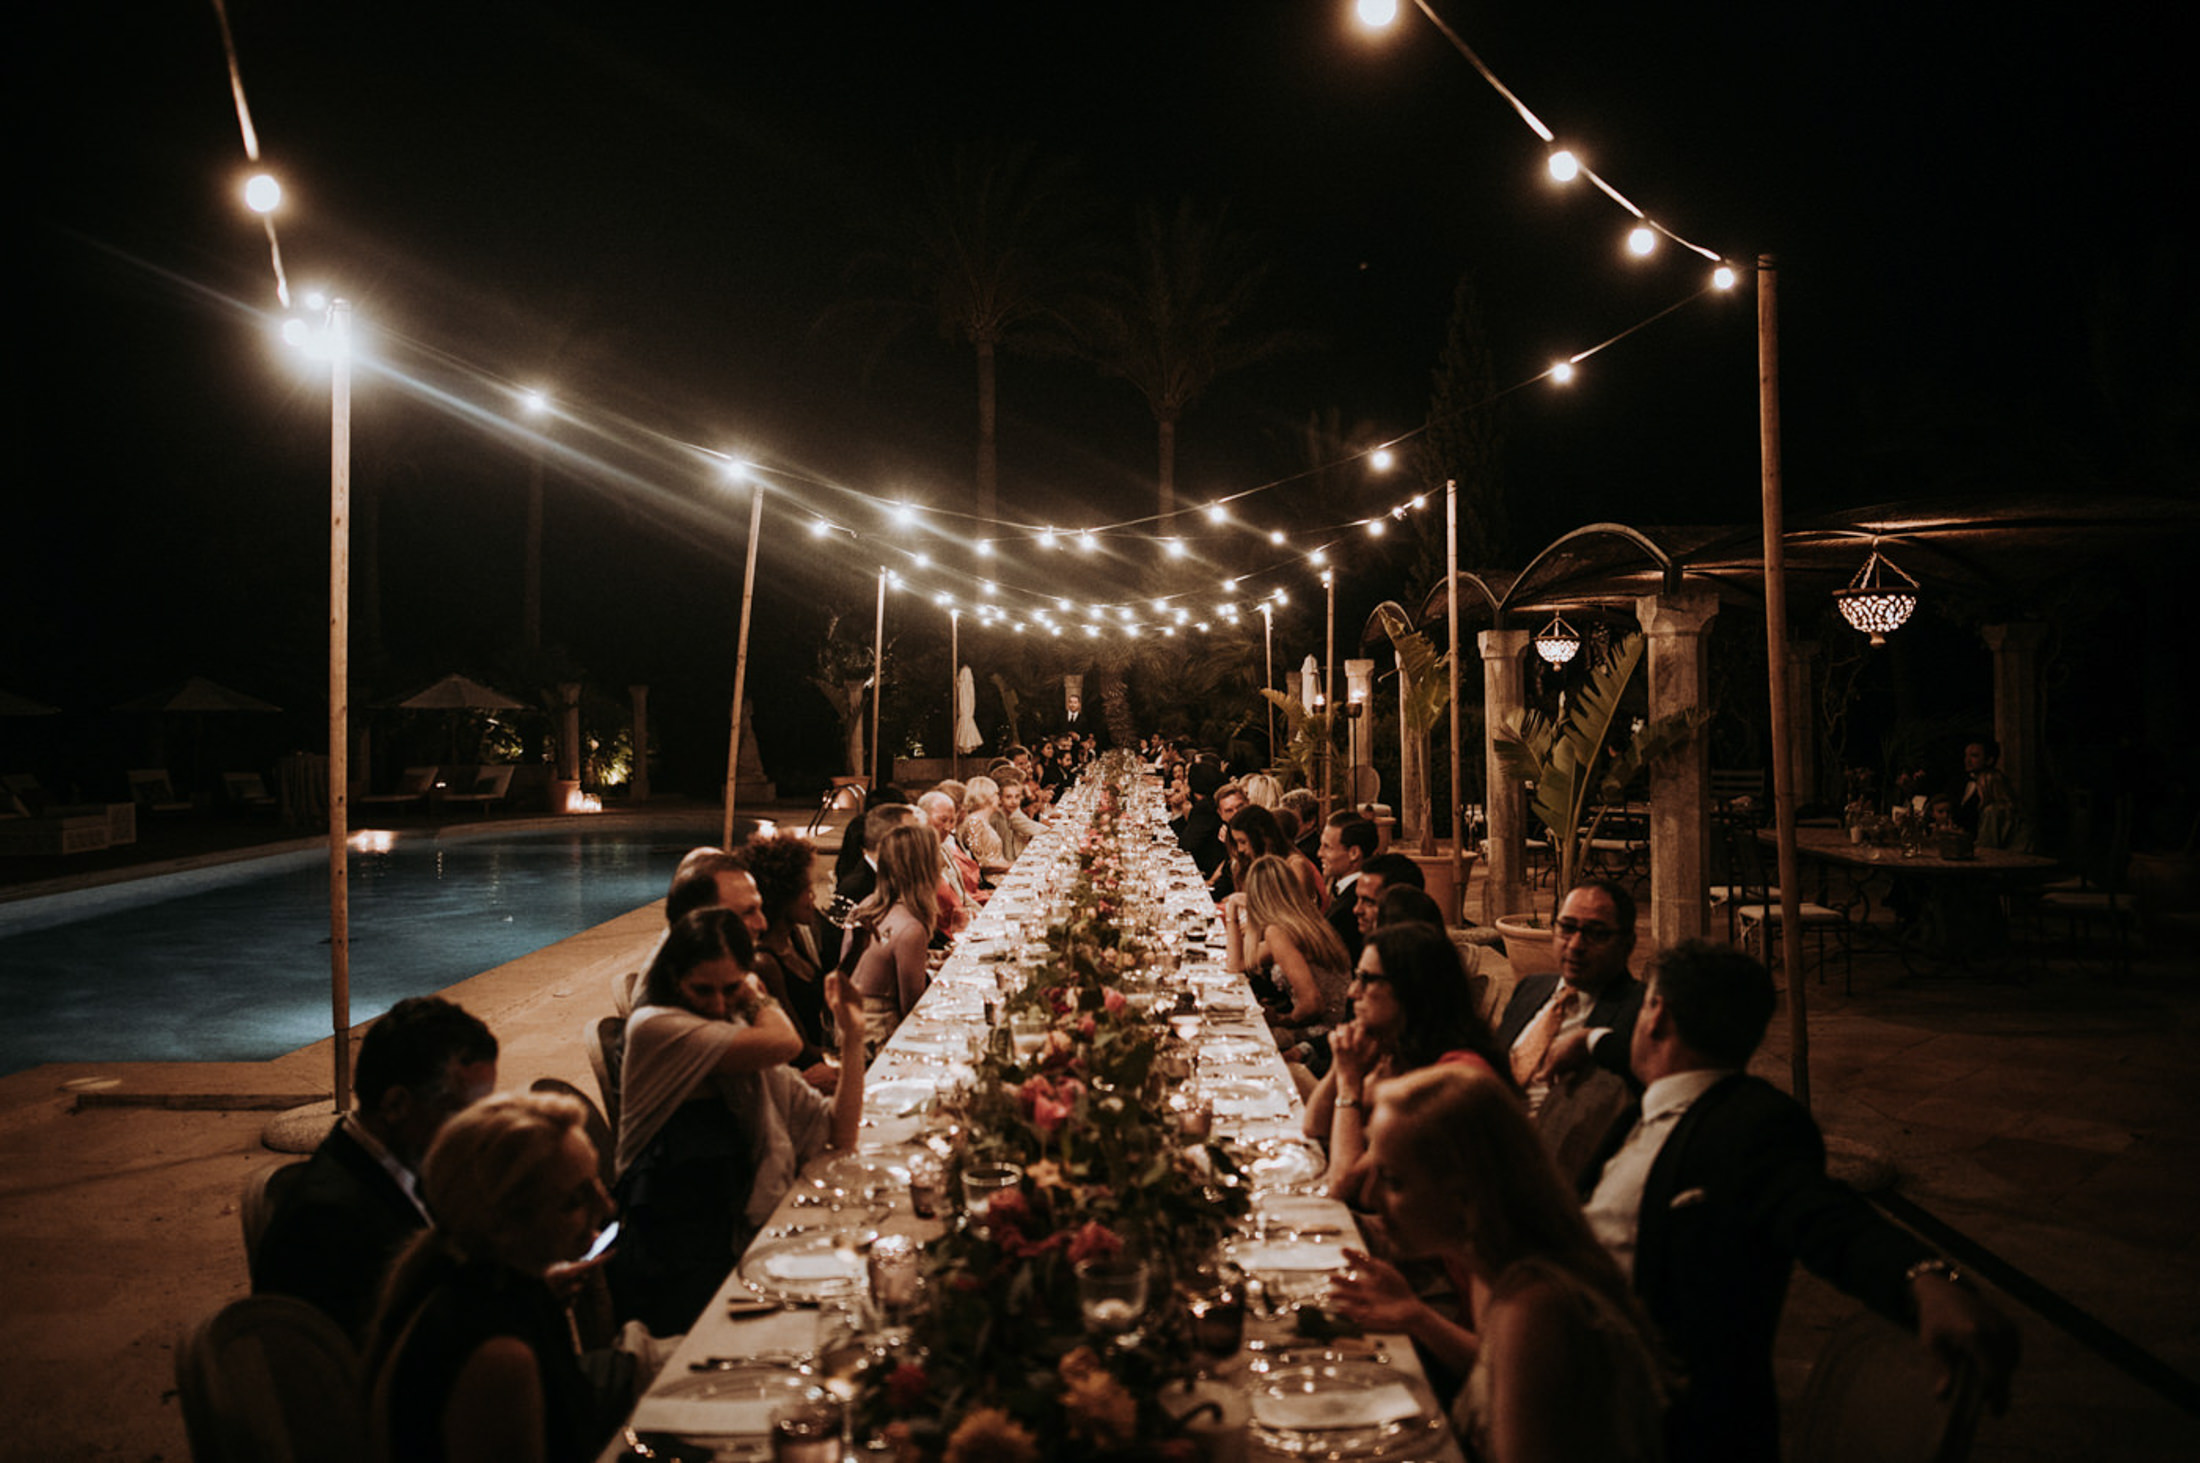 Wedding_Photographer_Mallorca_Daniela-Marquardt_Photography_New_York_Iceland_Tuscany_Santorini_Portugal_Austria_Bavaria_Elopement_Hochzeitsfotograf_AntjeRajat2_115